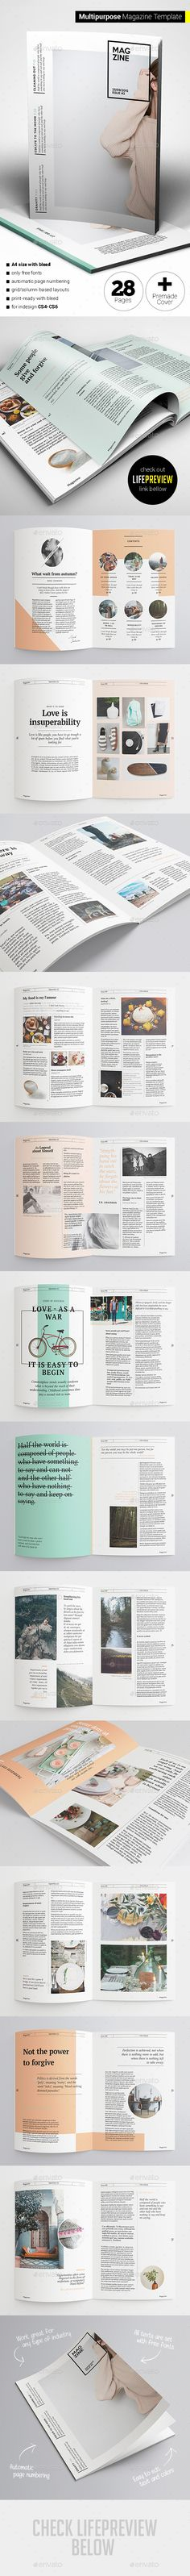 InDesign Magazine Template | Magazine Templates | Pinterest ...